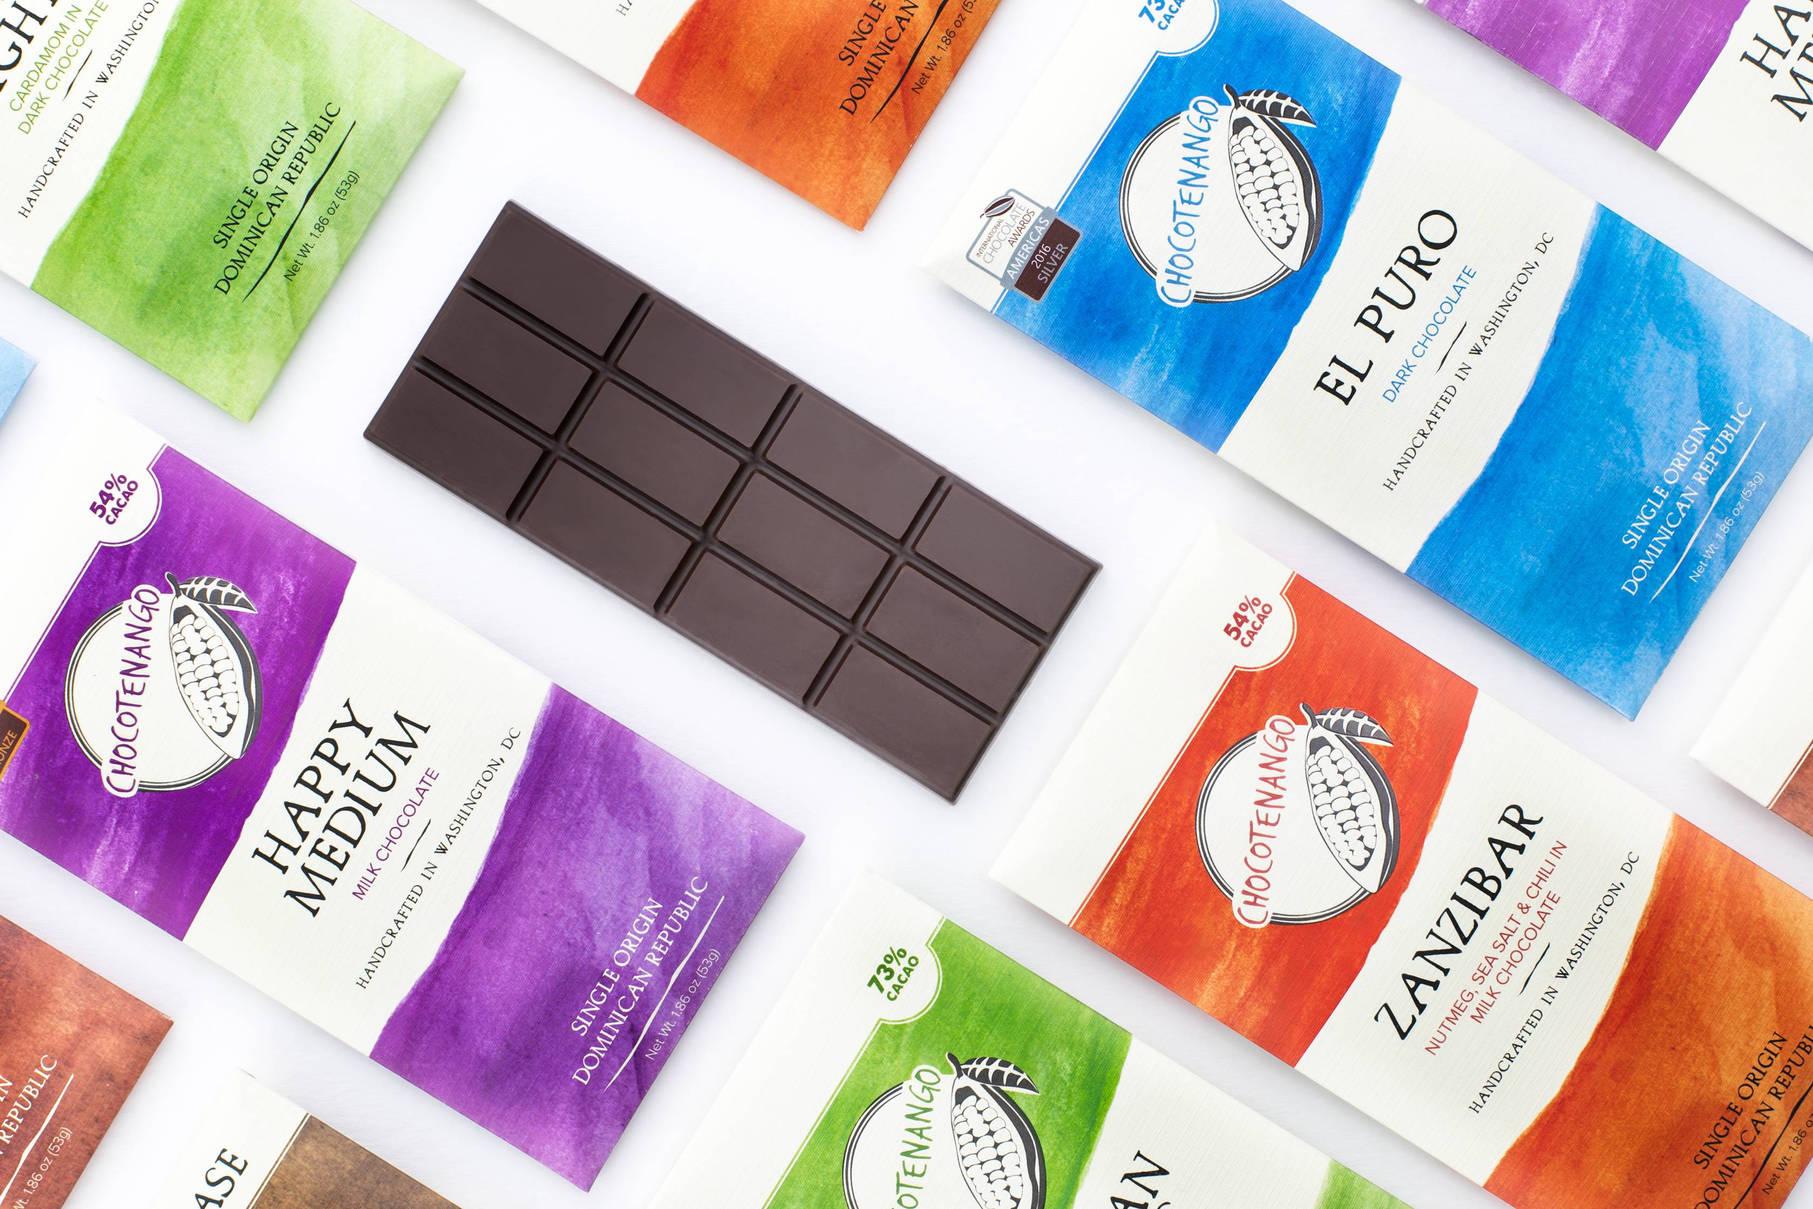 Bean to bar chocolates made in Washington DC